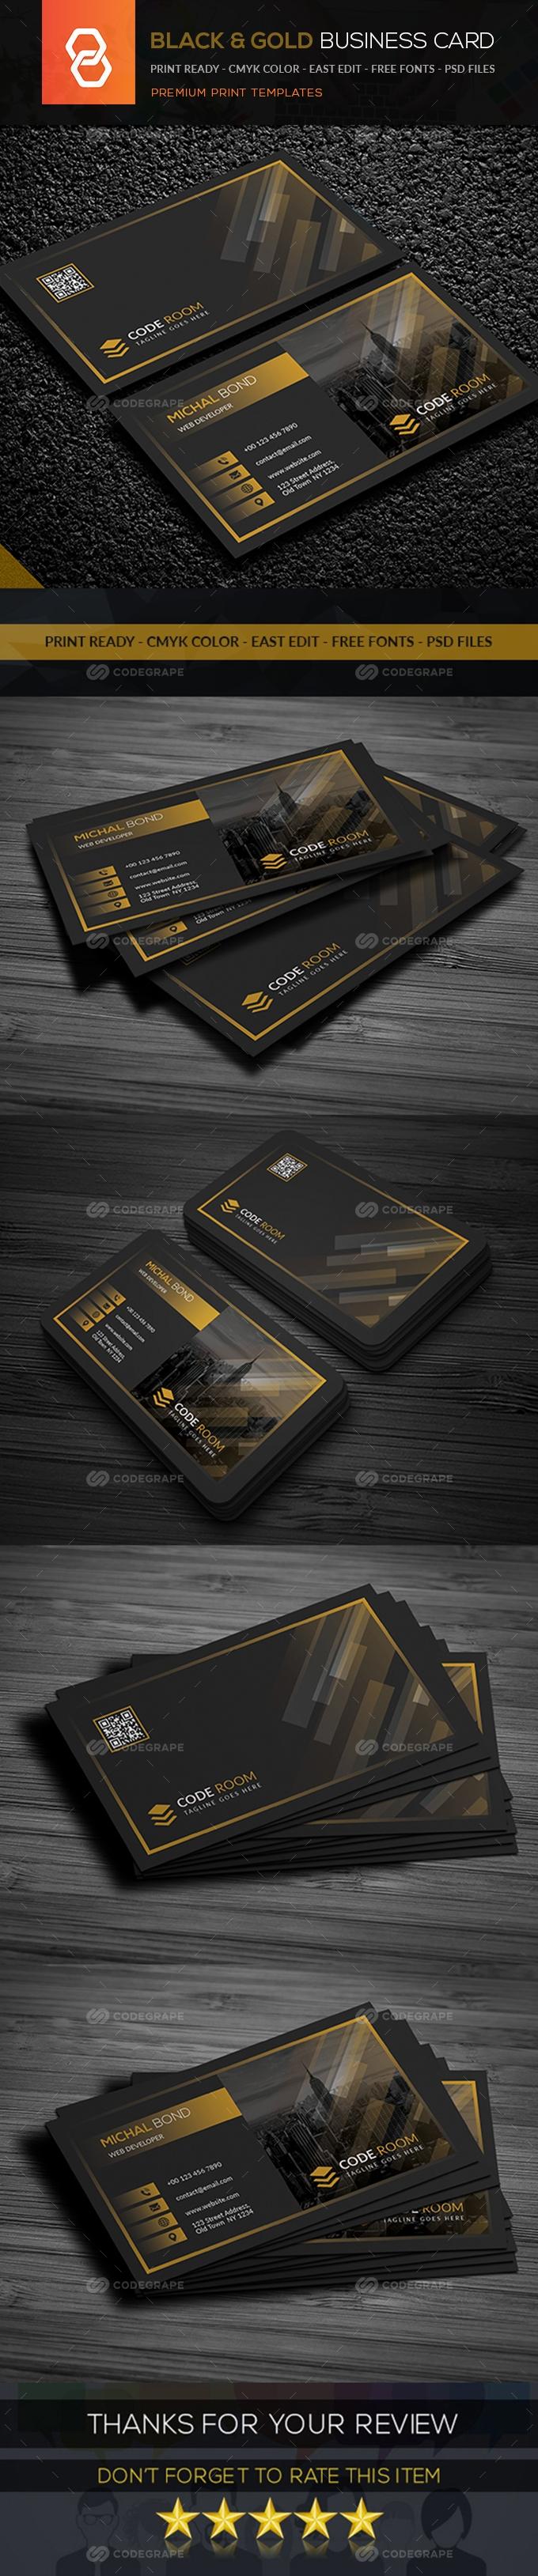 Black & Gold Business Card